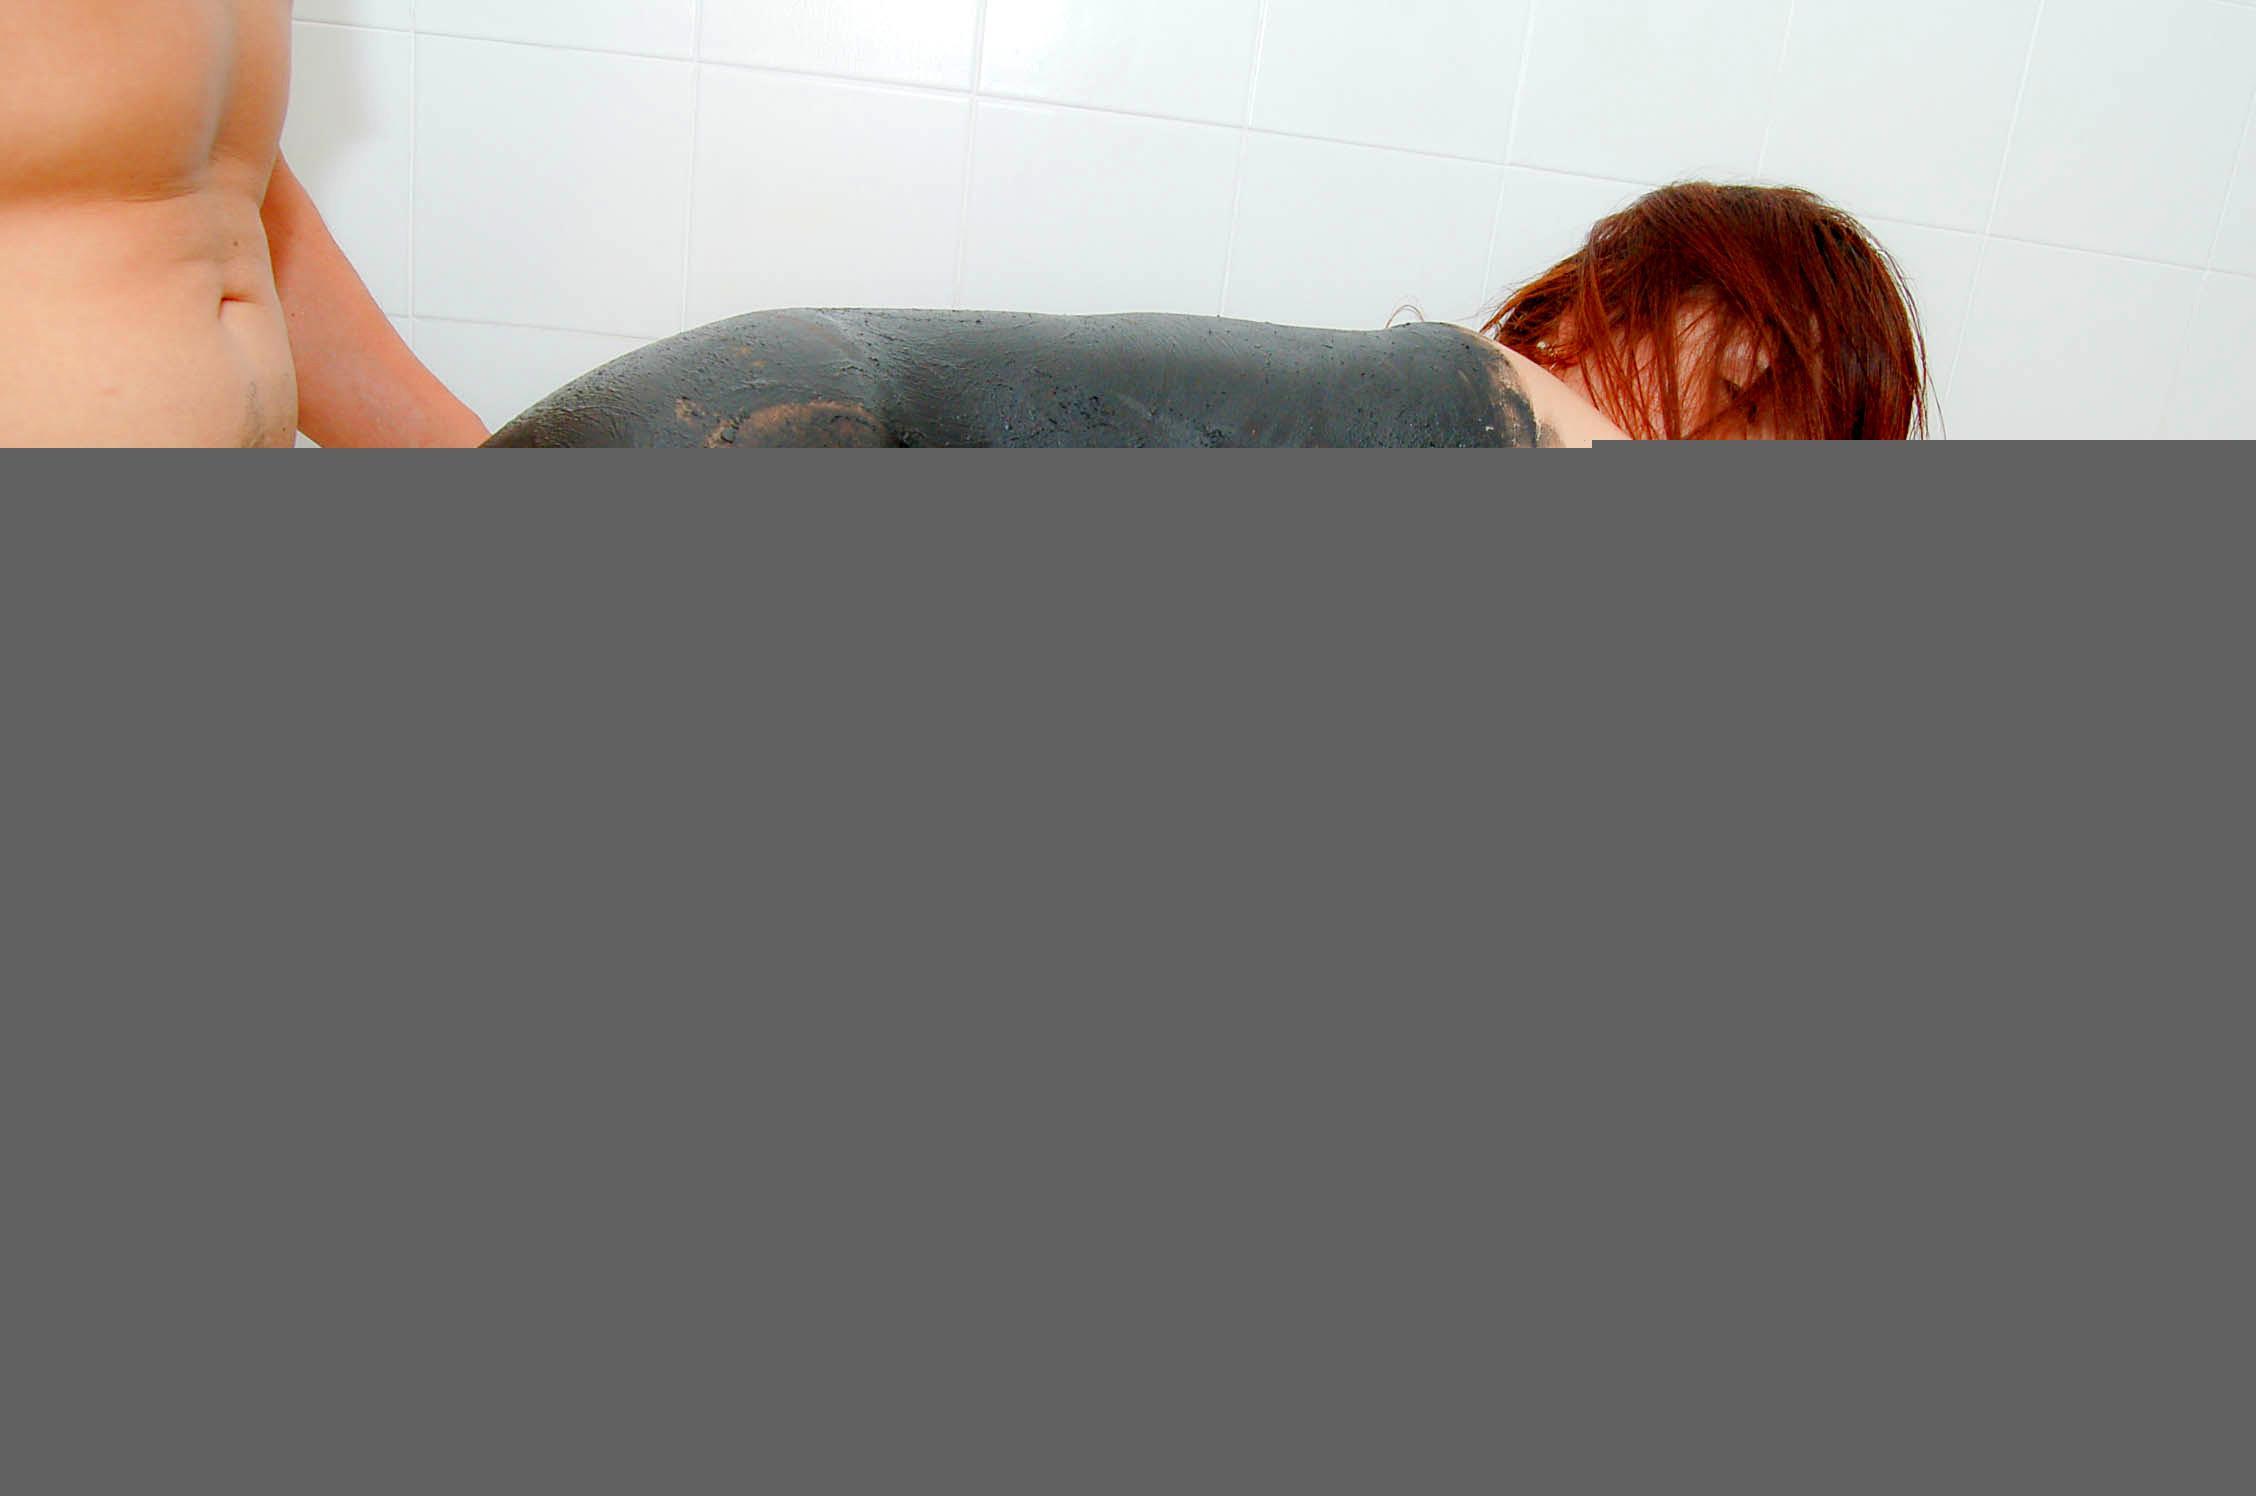 Femboy Having Anal Sex